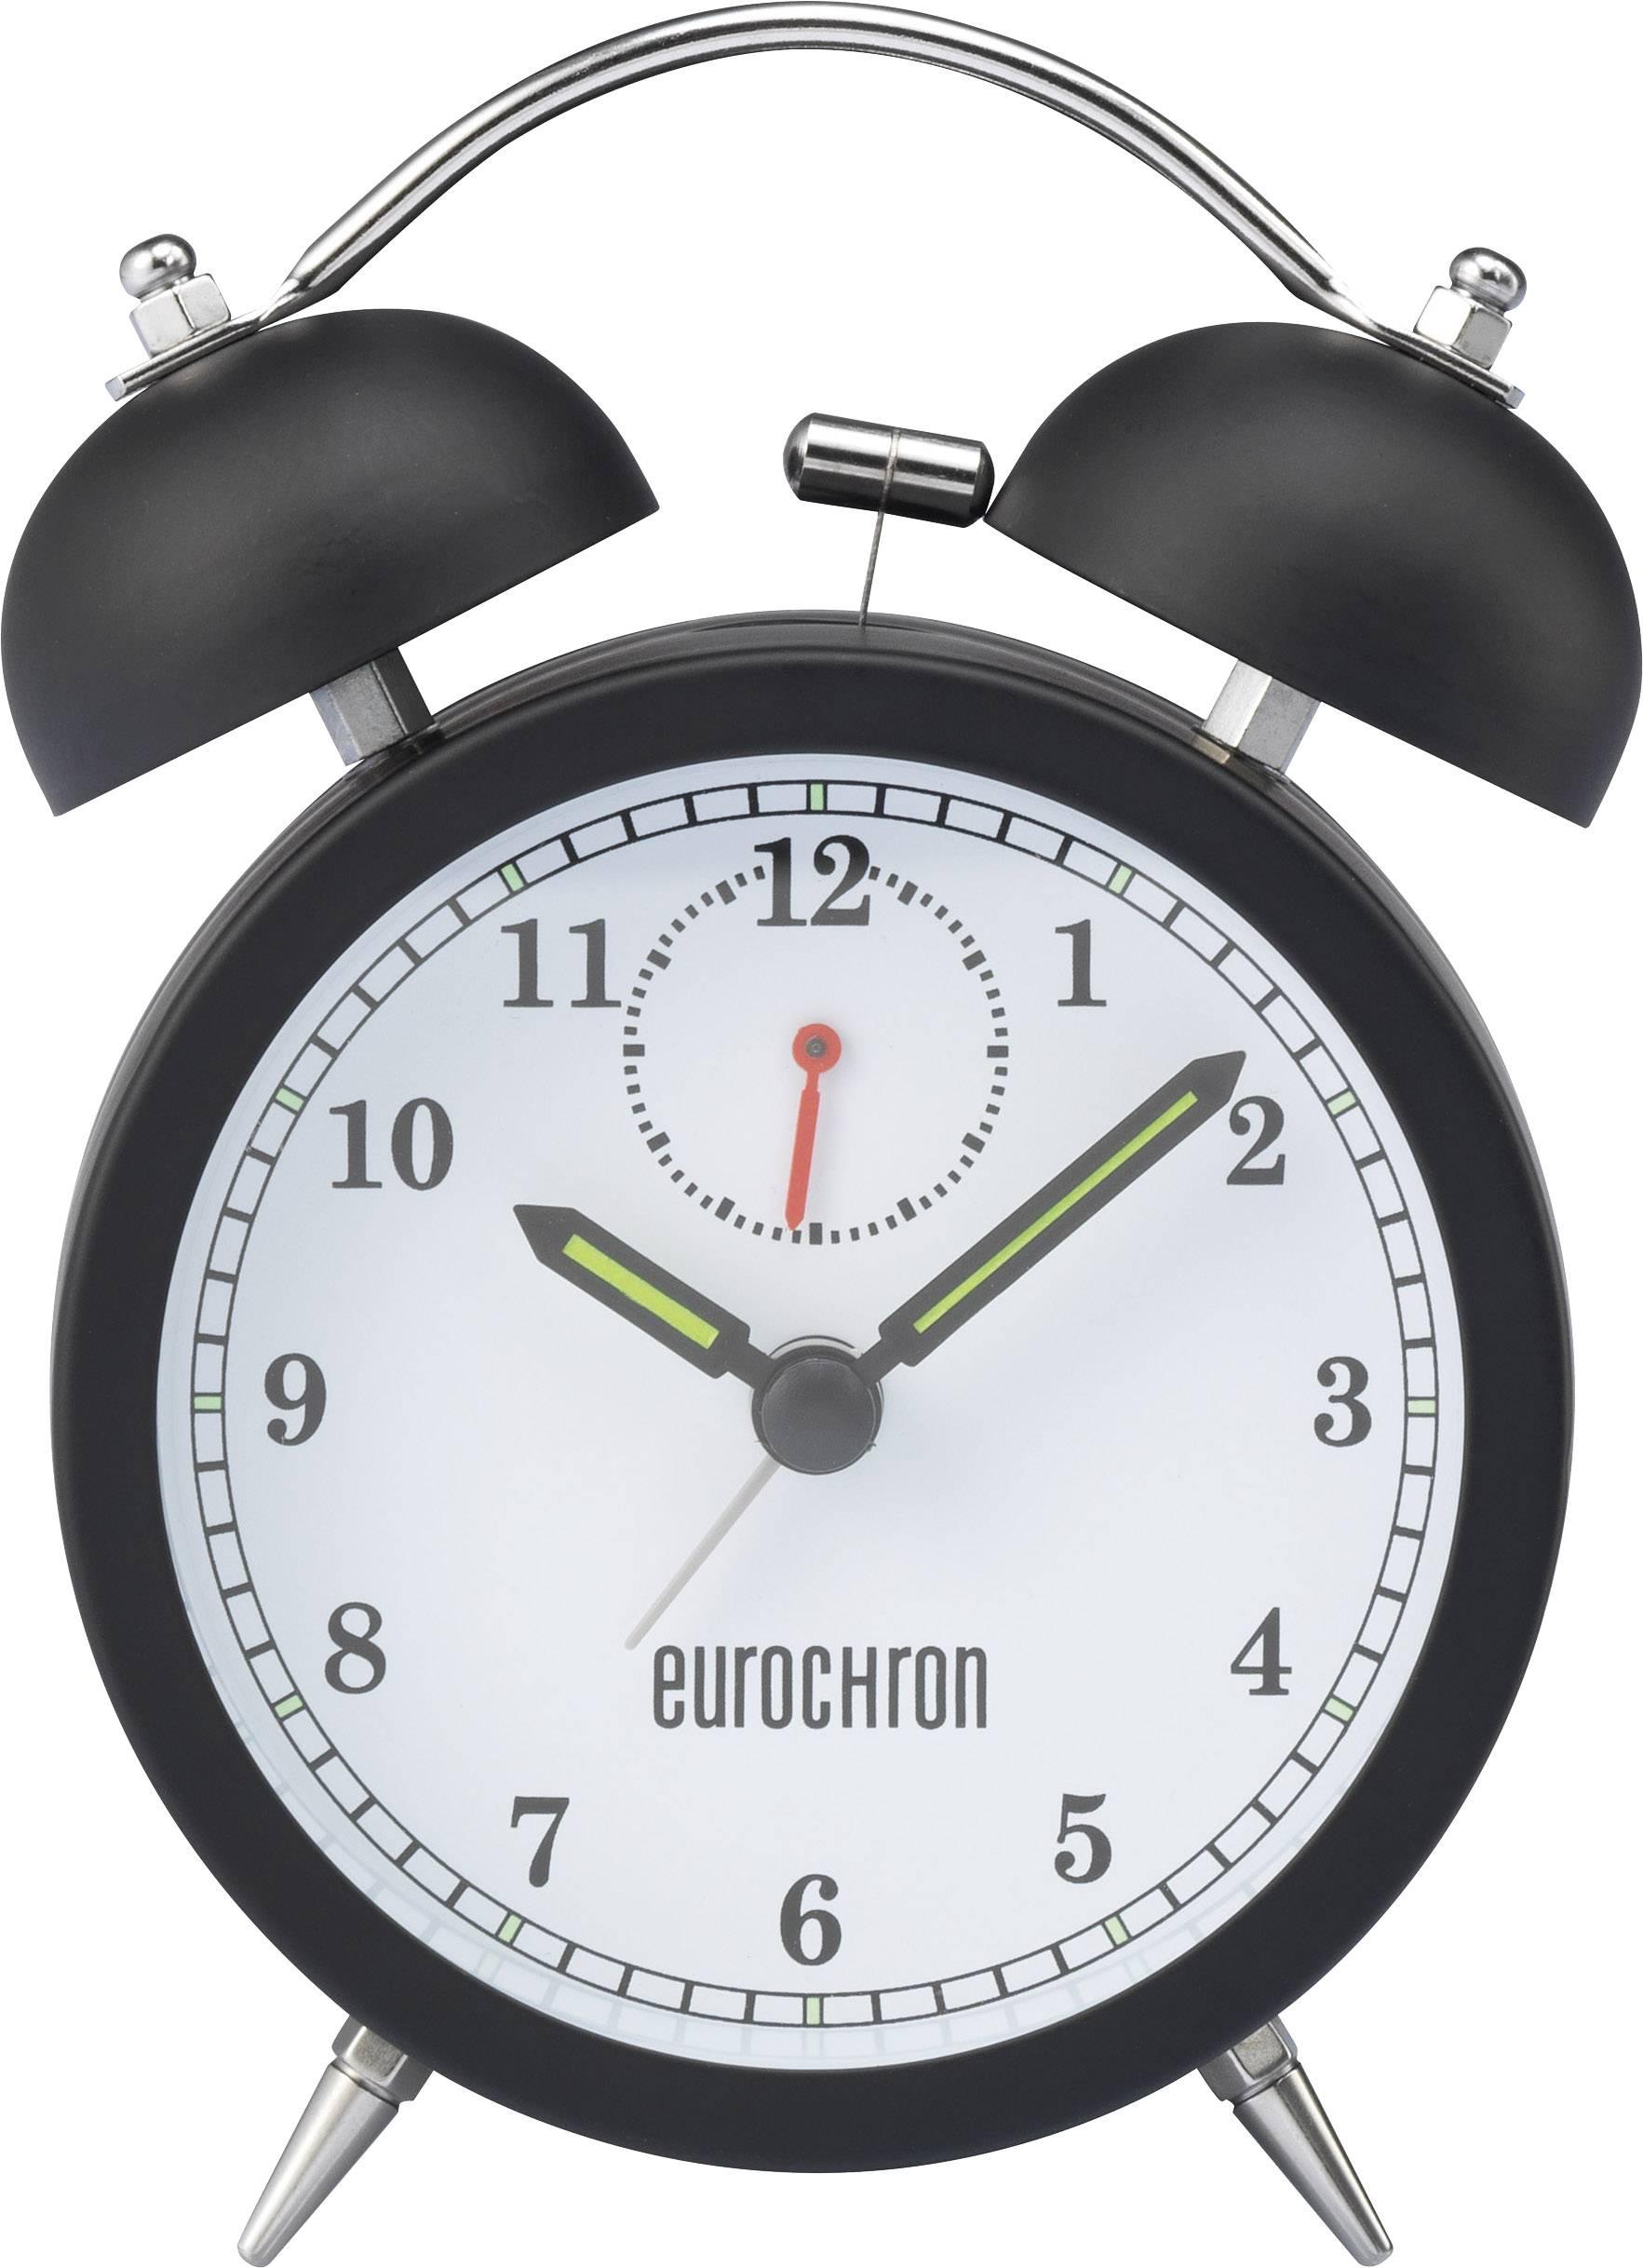 Quartz budík Eurochron EQWG 50, čierna